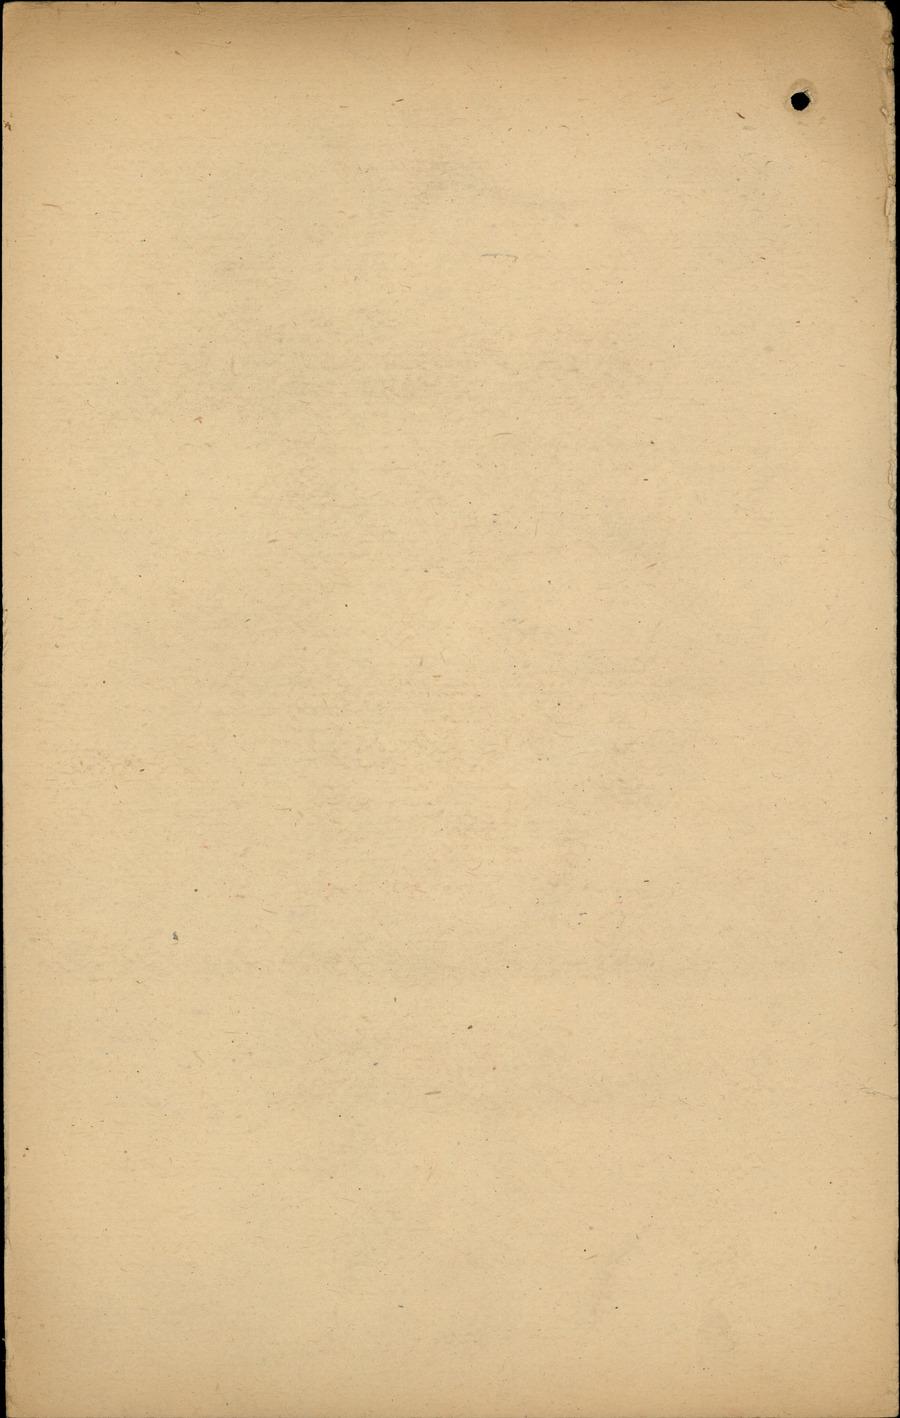 MARKHAM, Stephen - WW1 13/2844 - DPF [Duplicate Personnel File]